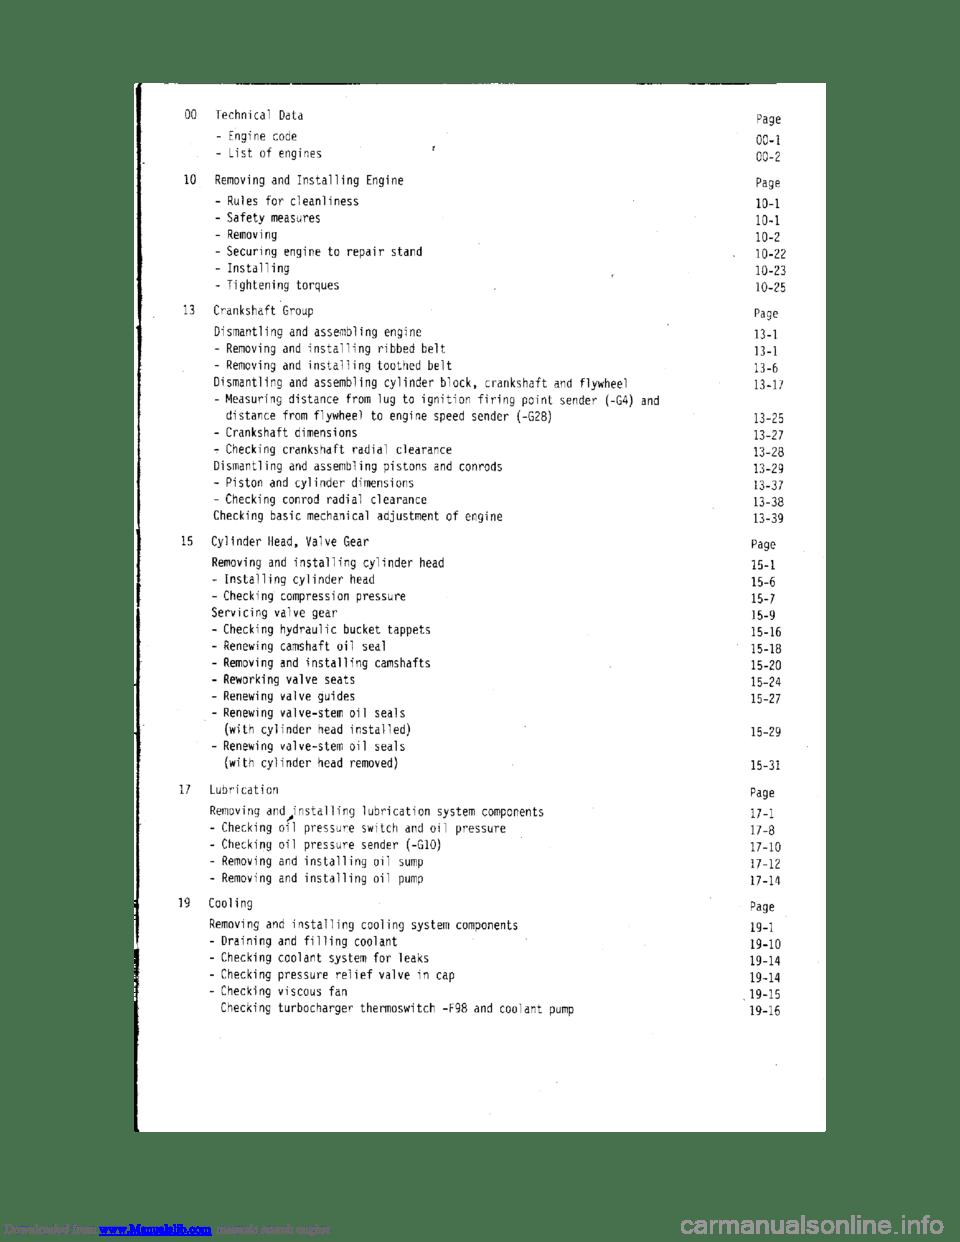 AUDI 100 1991 44 Engine Workshop Manual